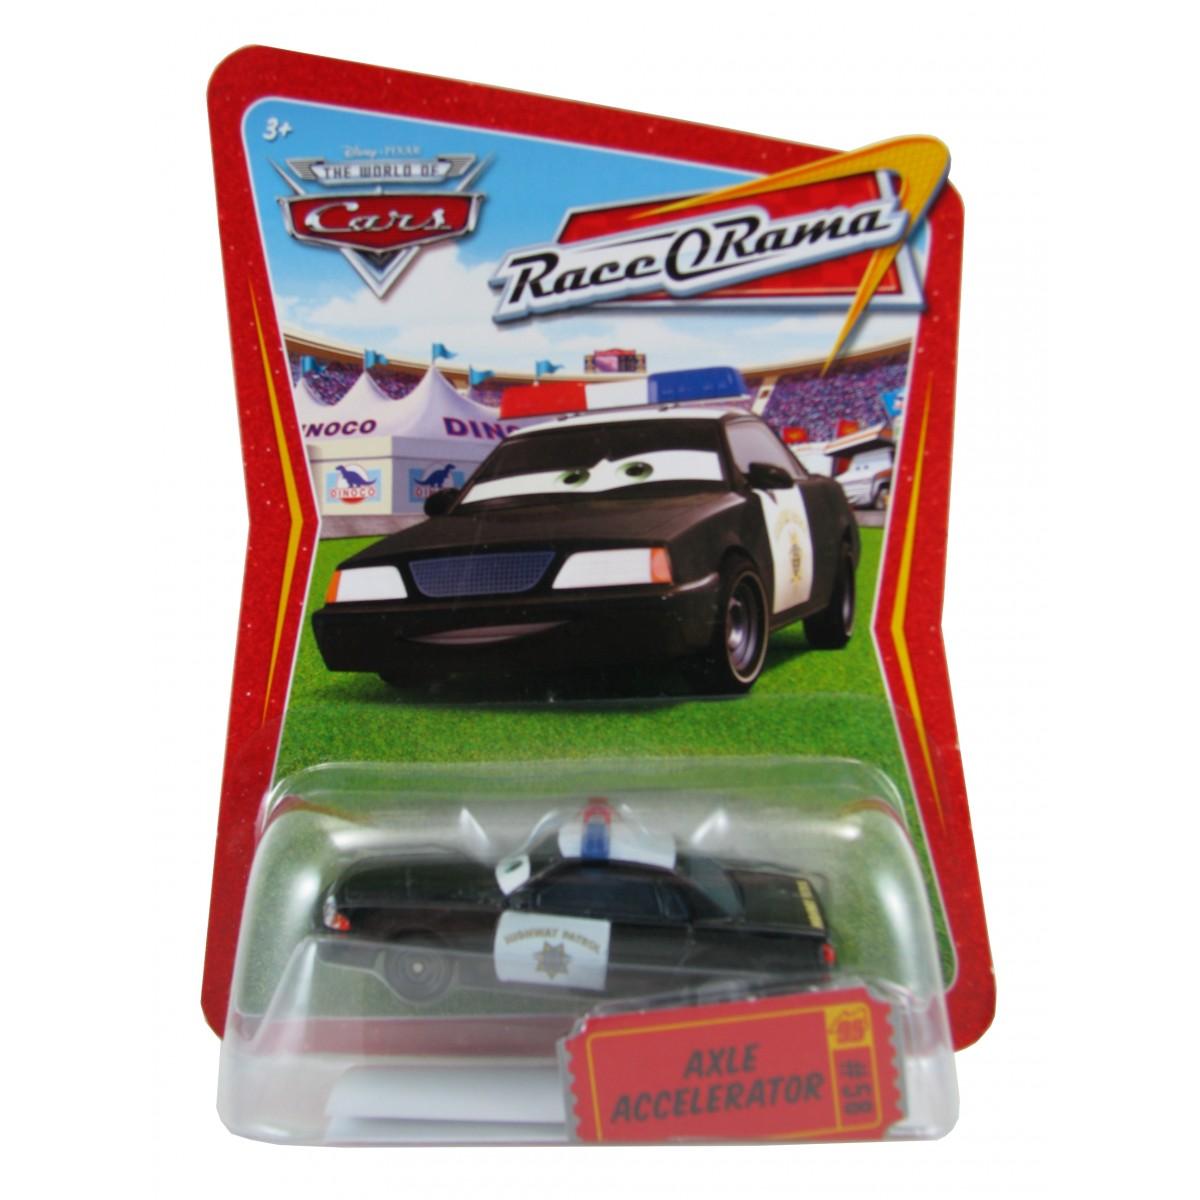 Disney Pixar - Cars - Axle Accelerator